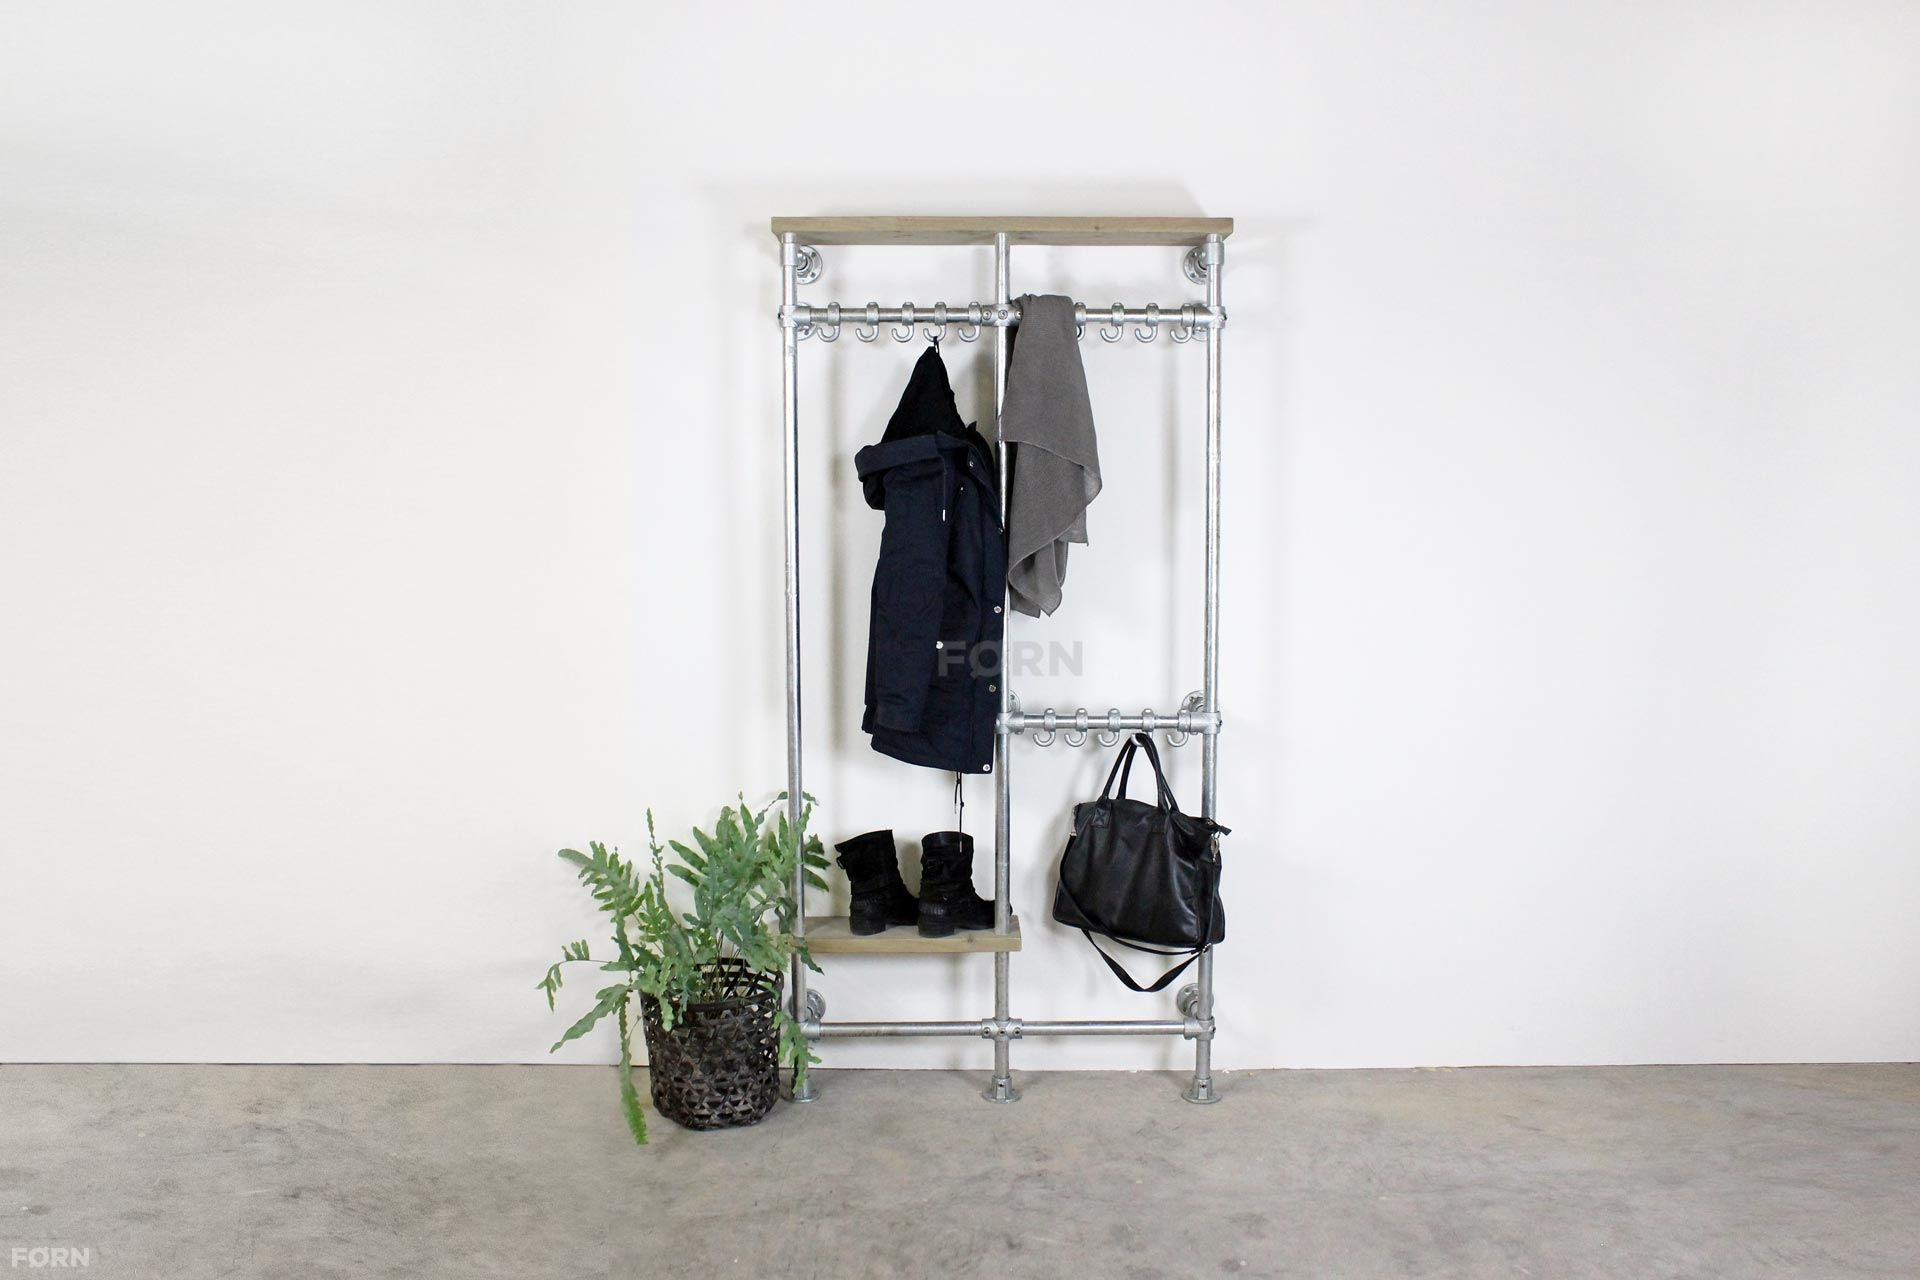 Wohnideen Büro Im Wohnzimmer bauholz garderobe brier bauholzmoebeldesign de bauholz design